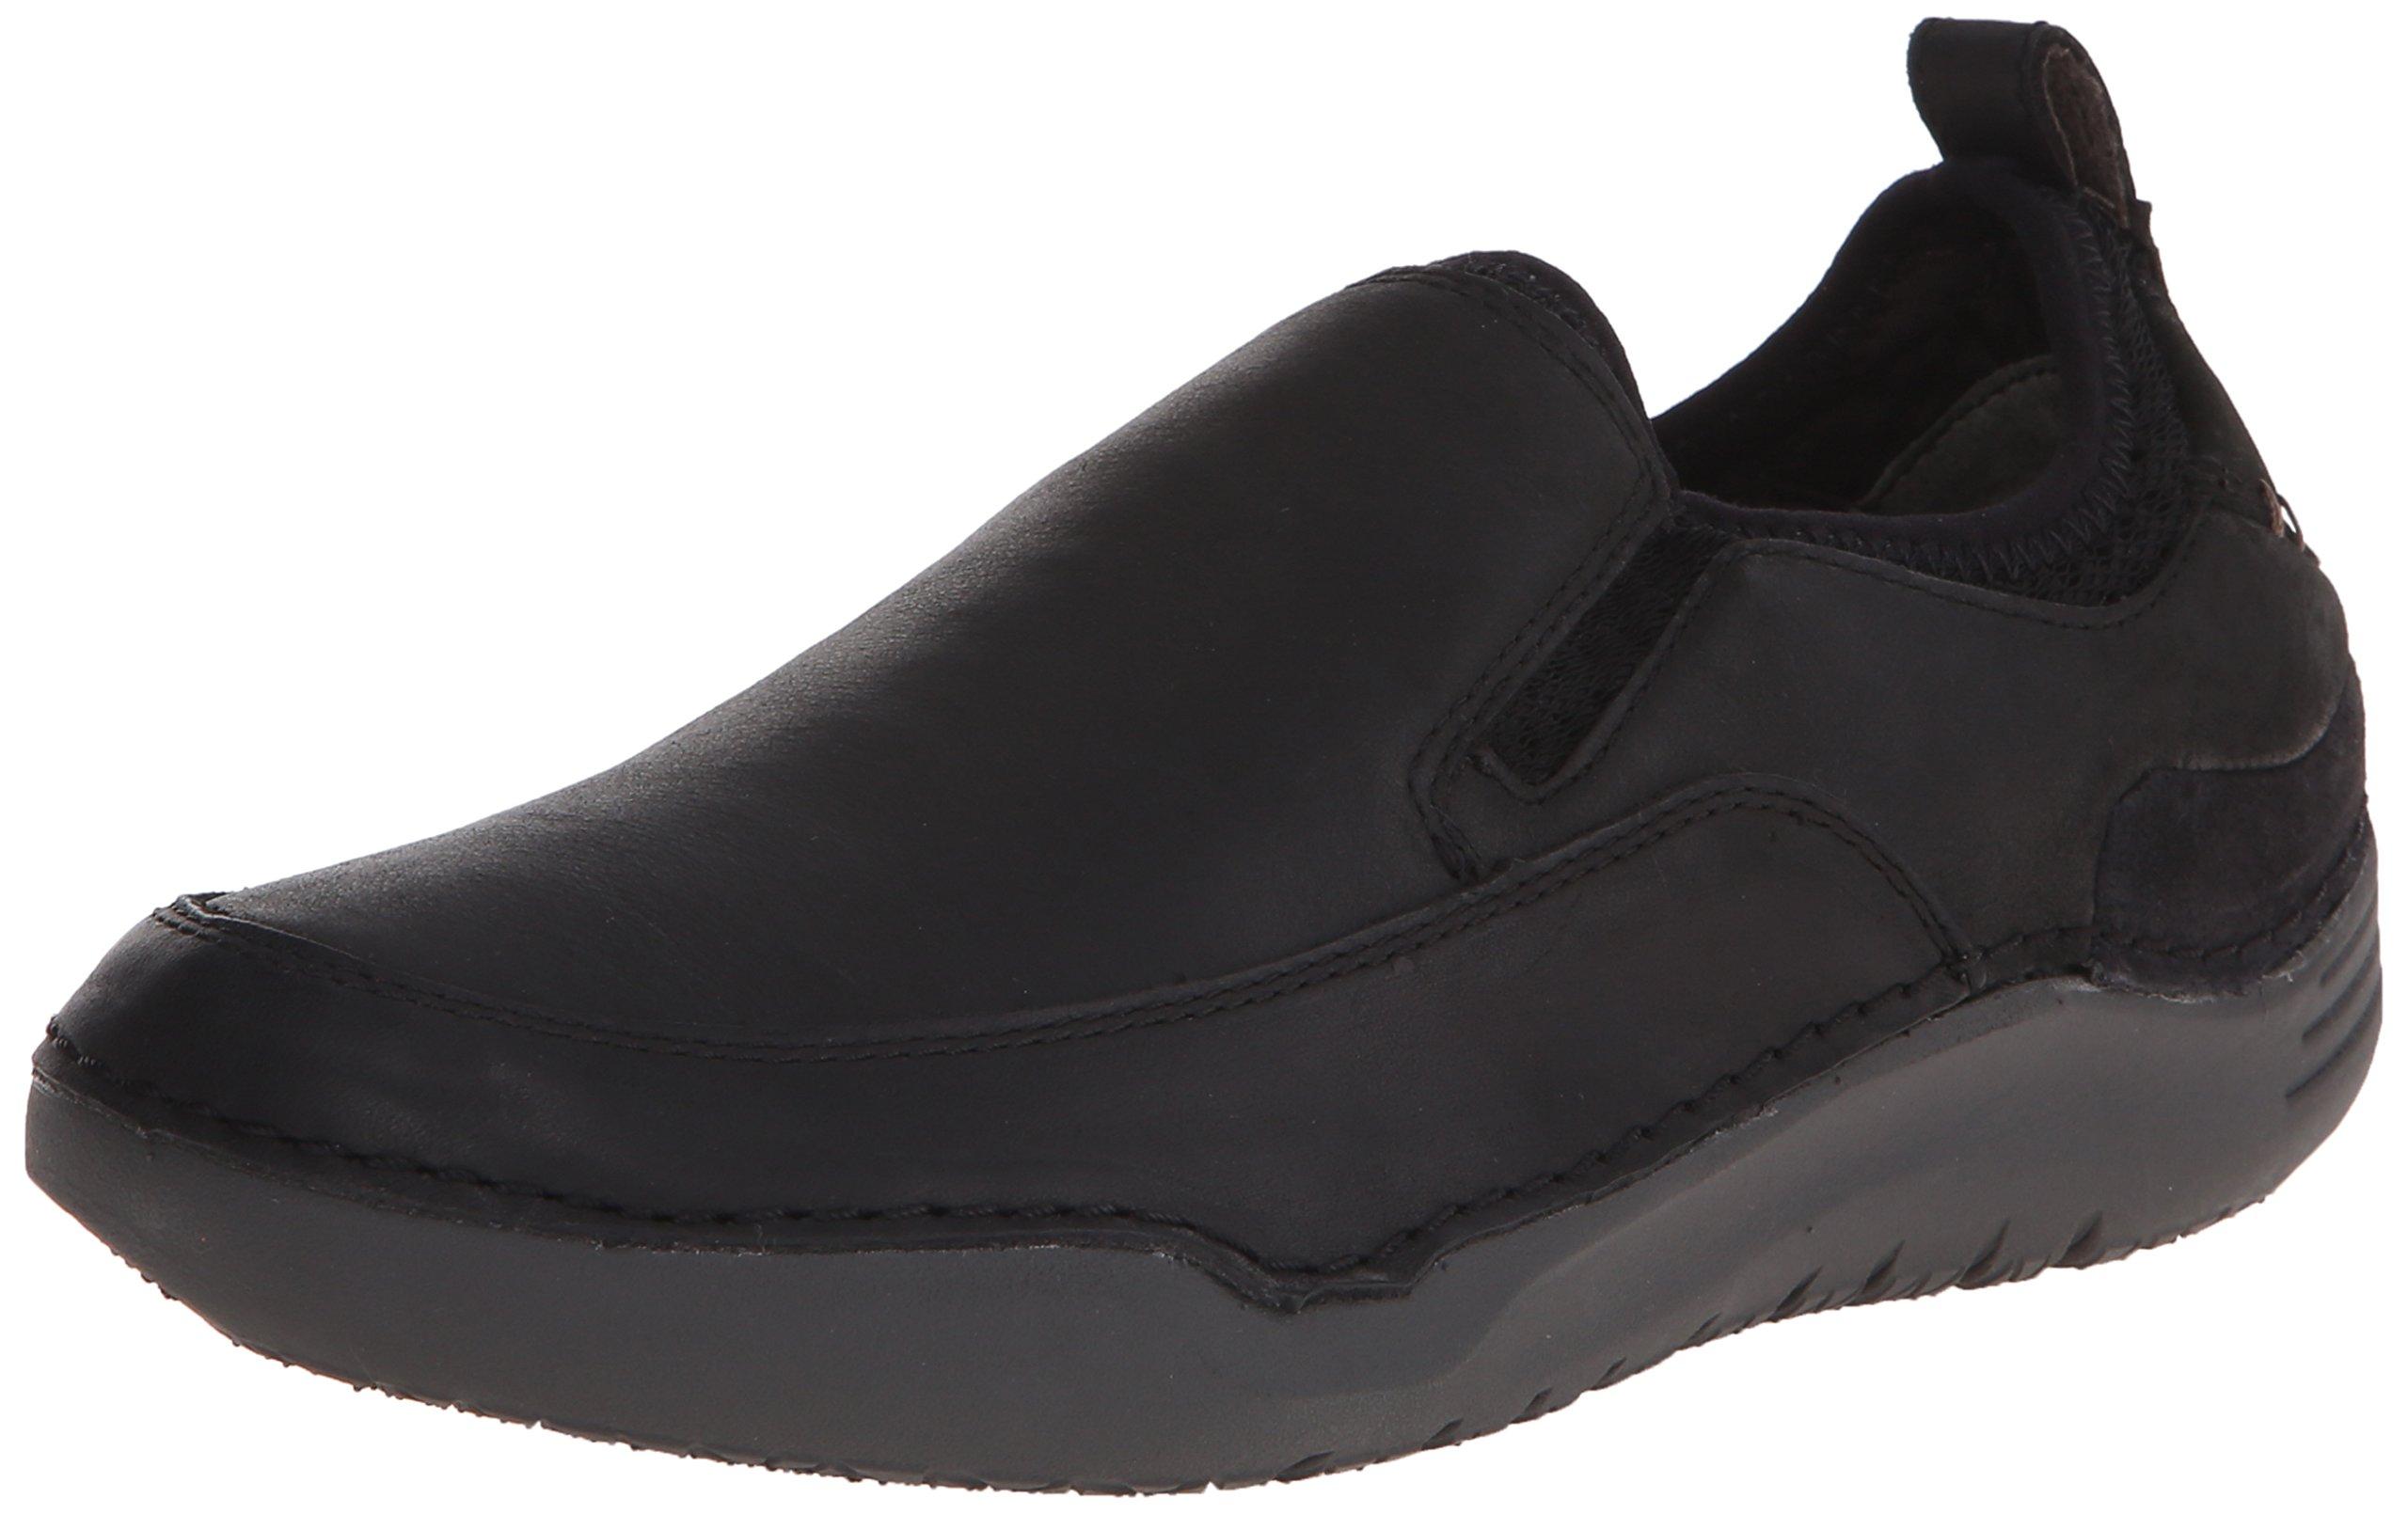 Hush Puppies Men's Crofton Method Slip-On Loafer, Black Leather, 7 M US